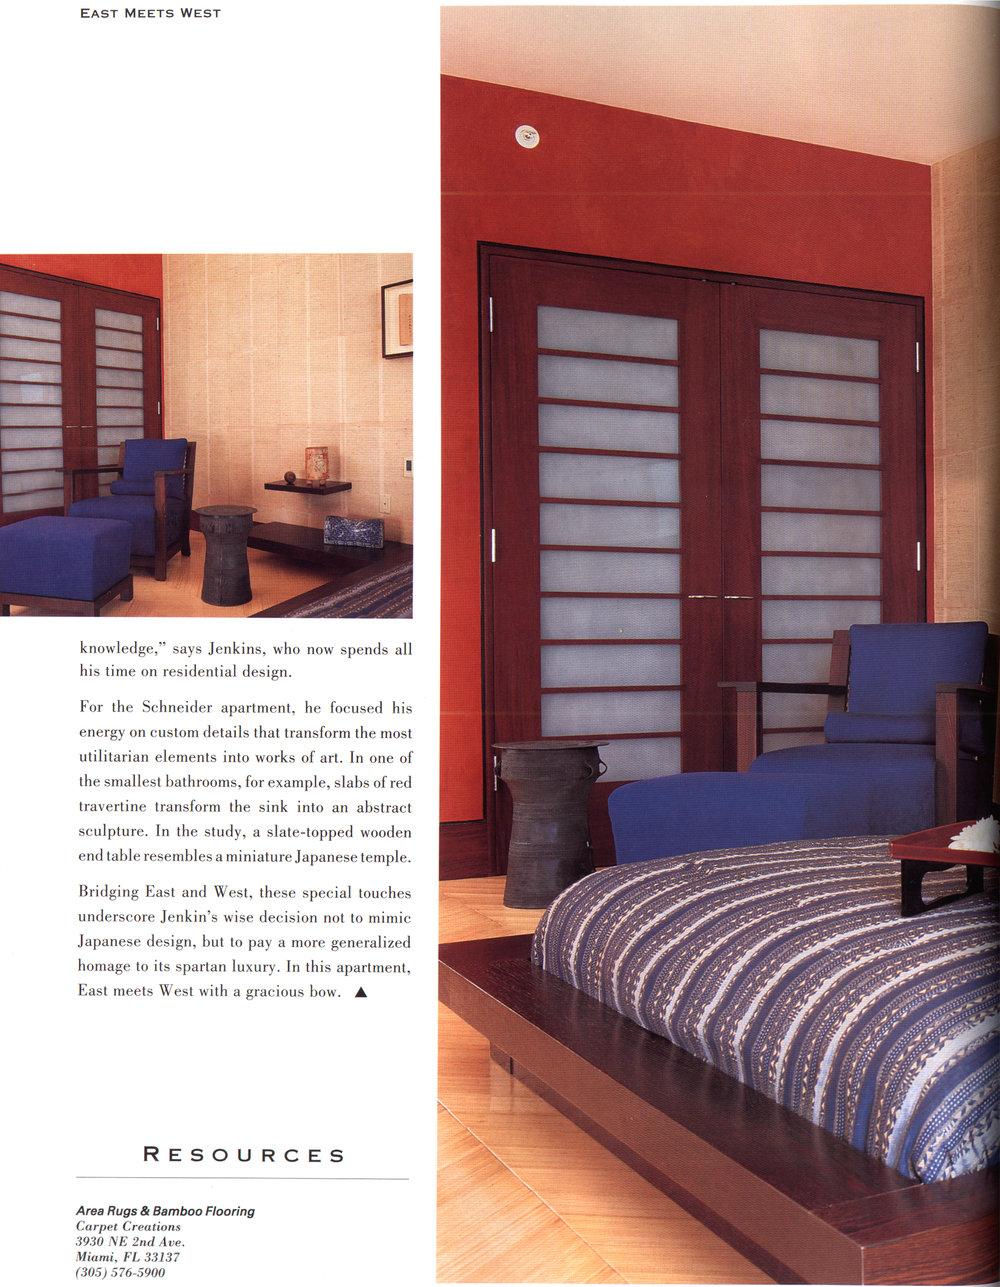 FA-page9 copy.jpg